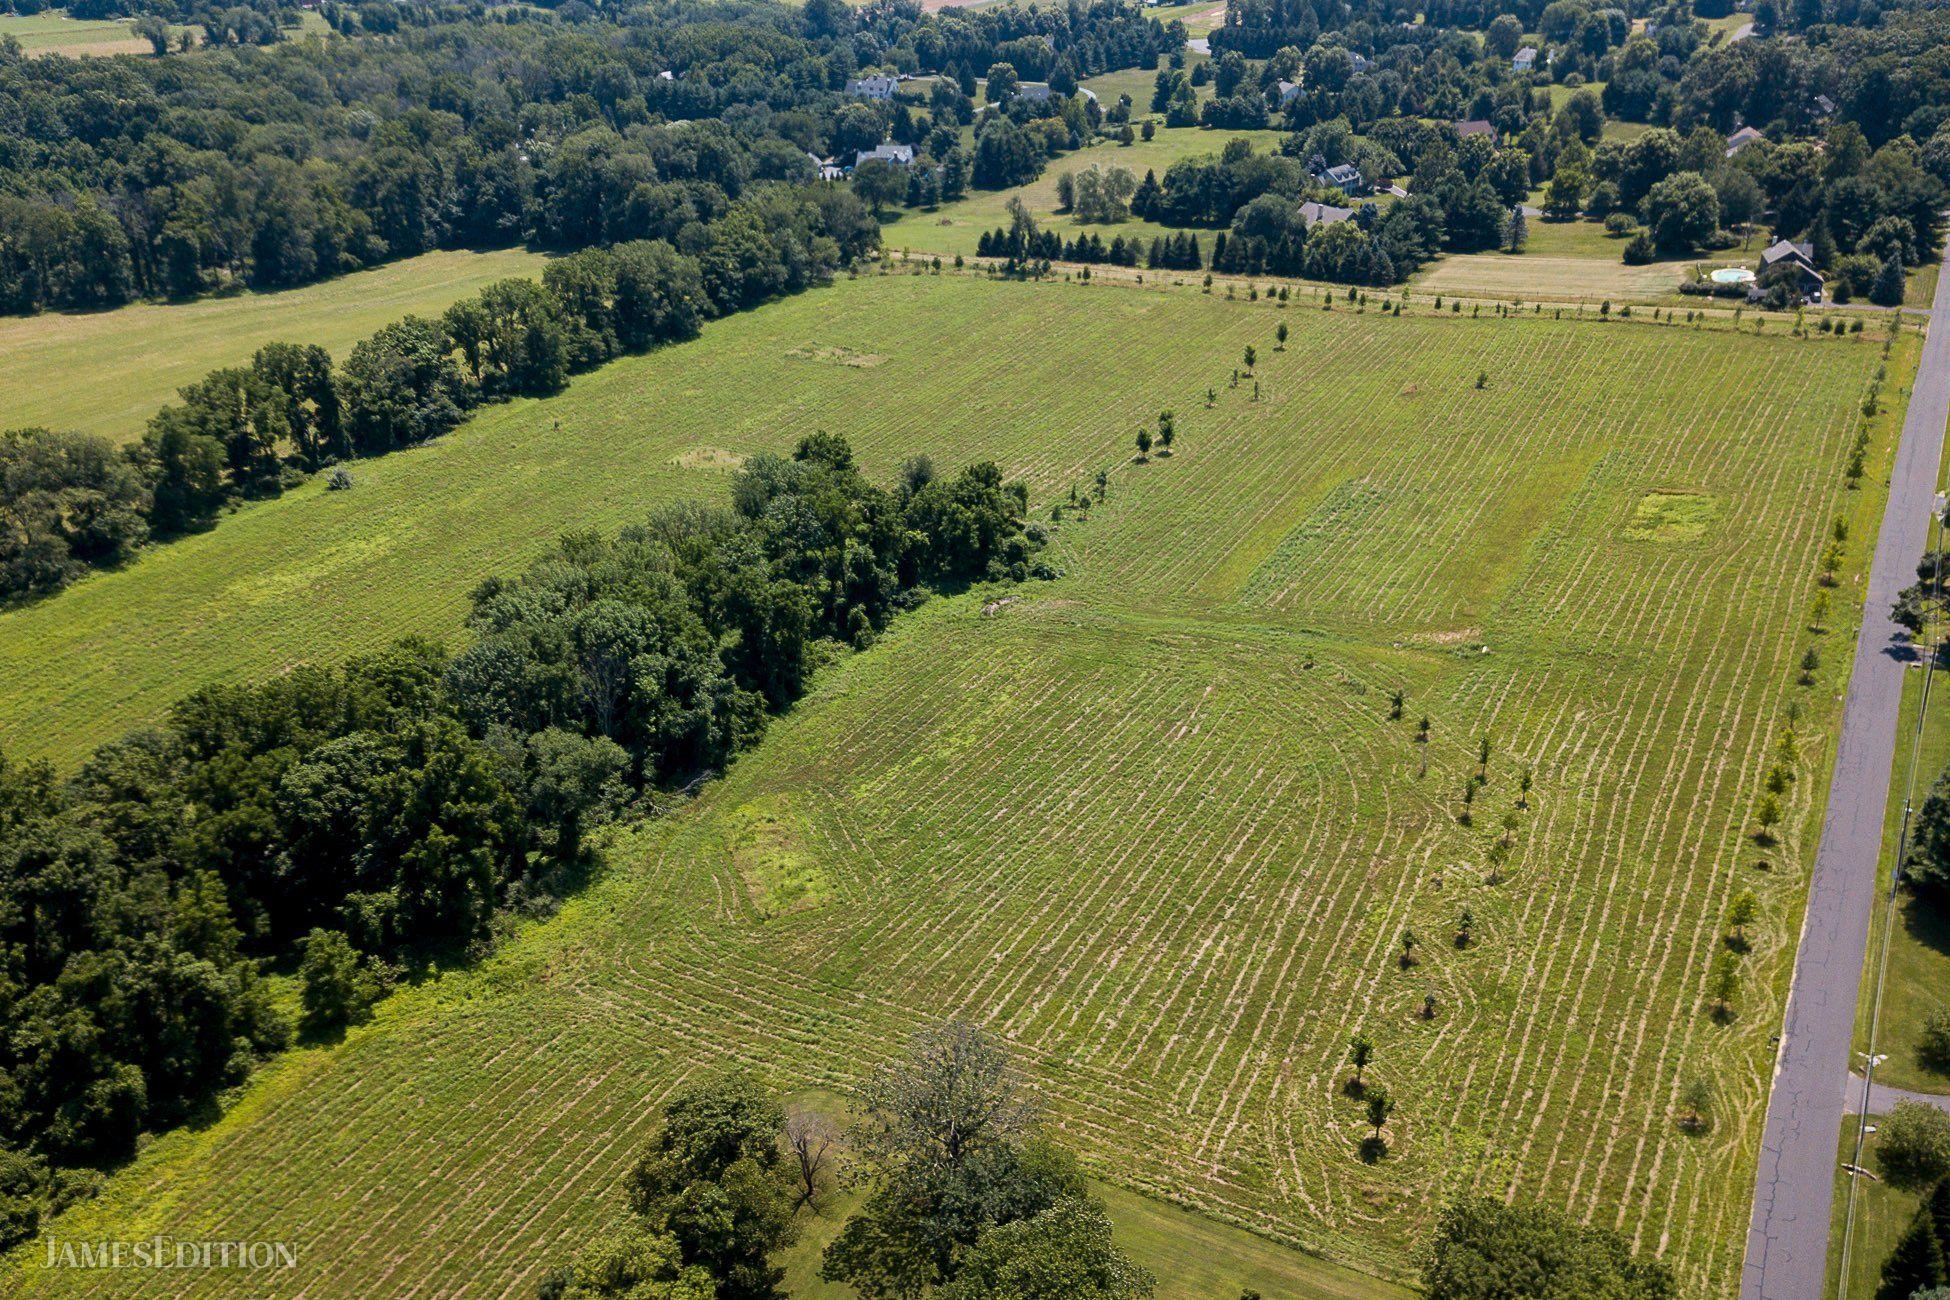 Land in Doylestown, Pennsylvania, United States 1